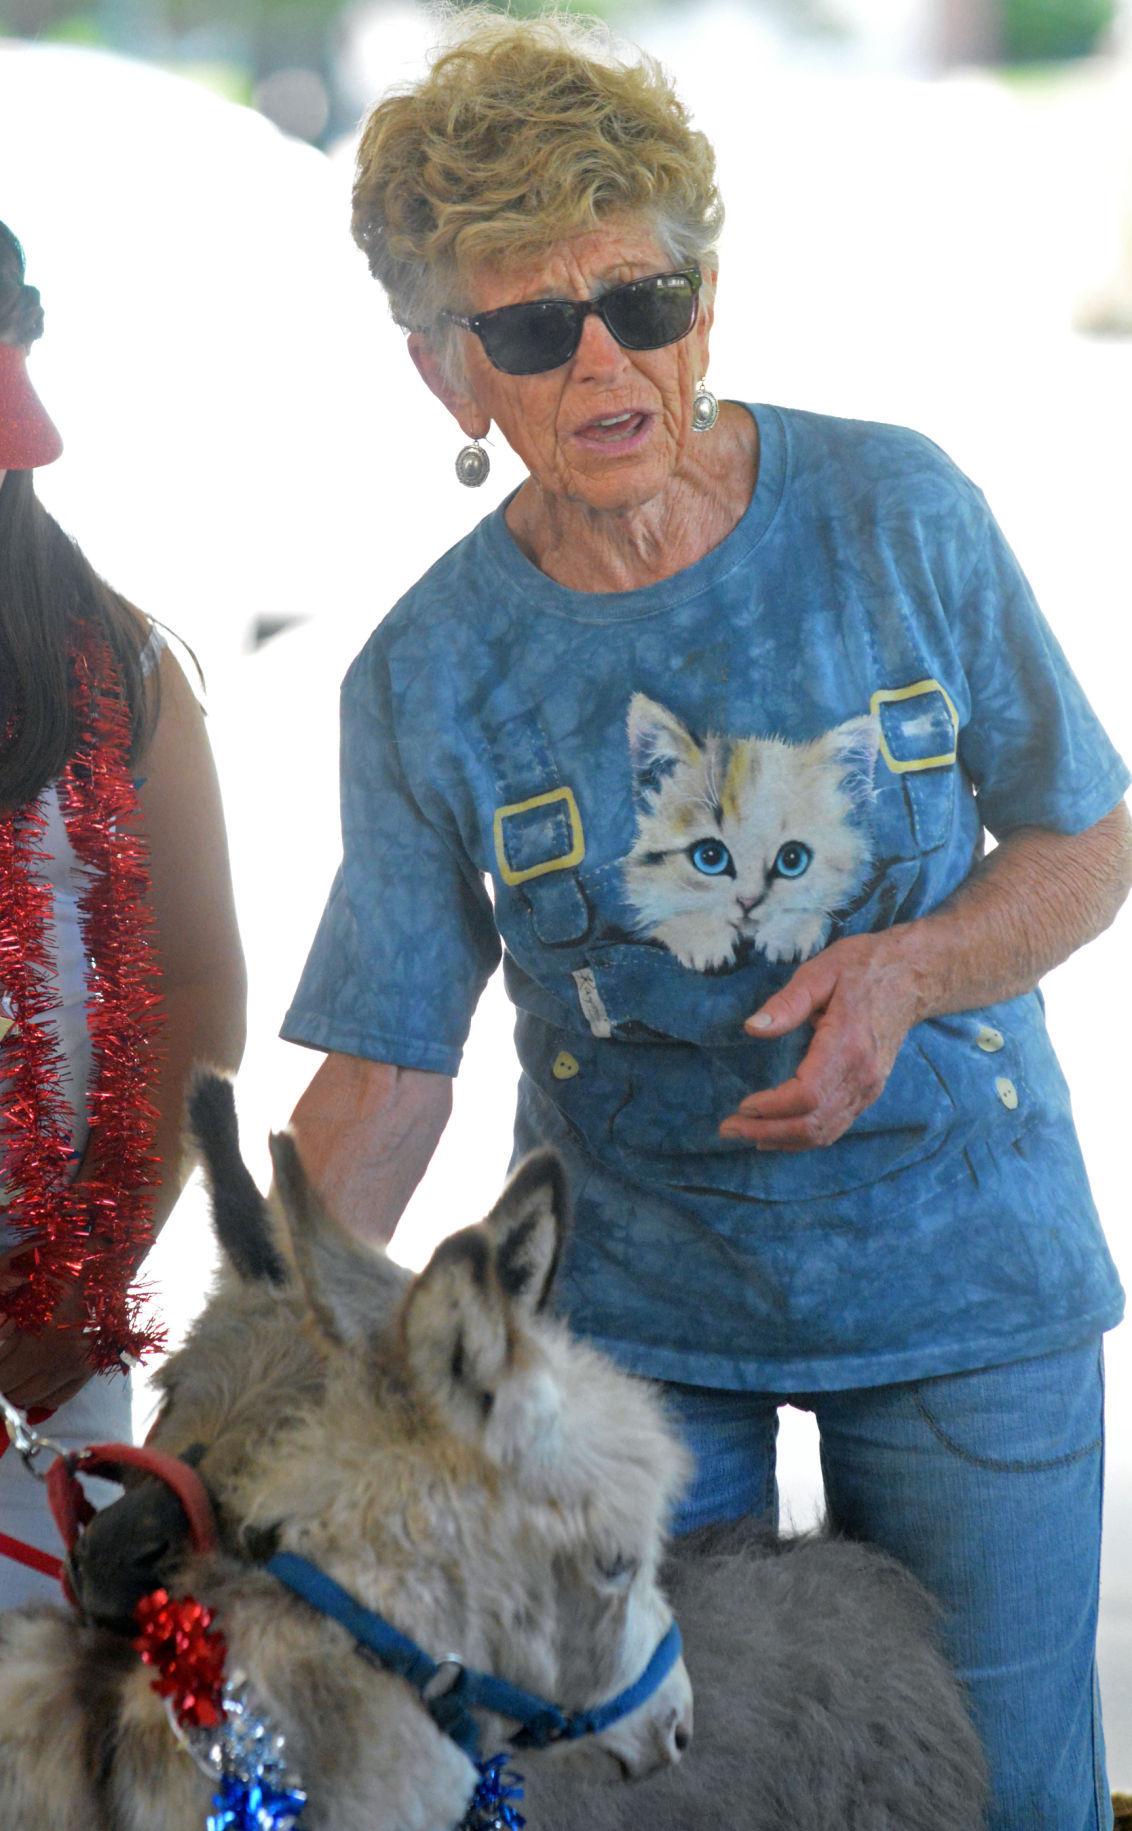 Miniature donkeys bring big smiles | Local | columbustelegram com